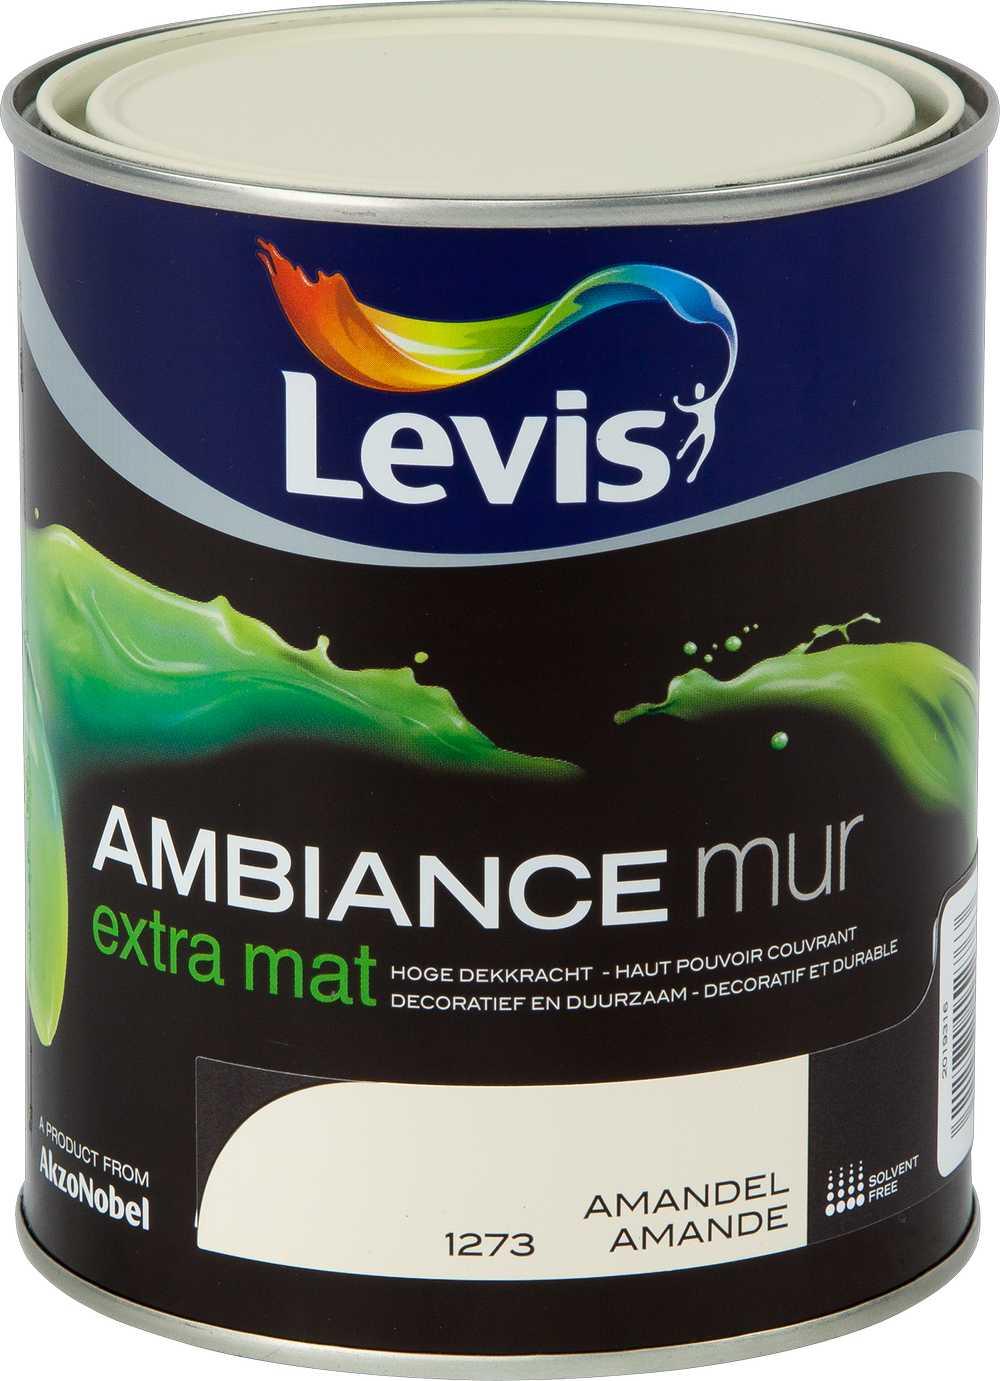 AMBIANCE MUR EXTRA MAT - AMANDEL 1273 1 L